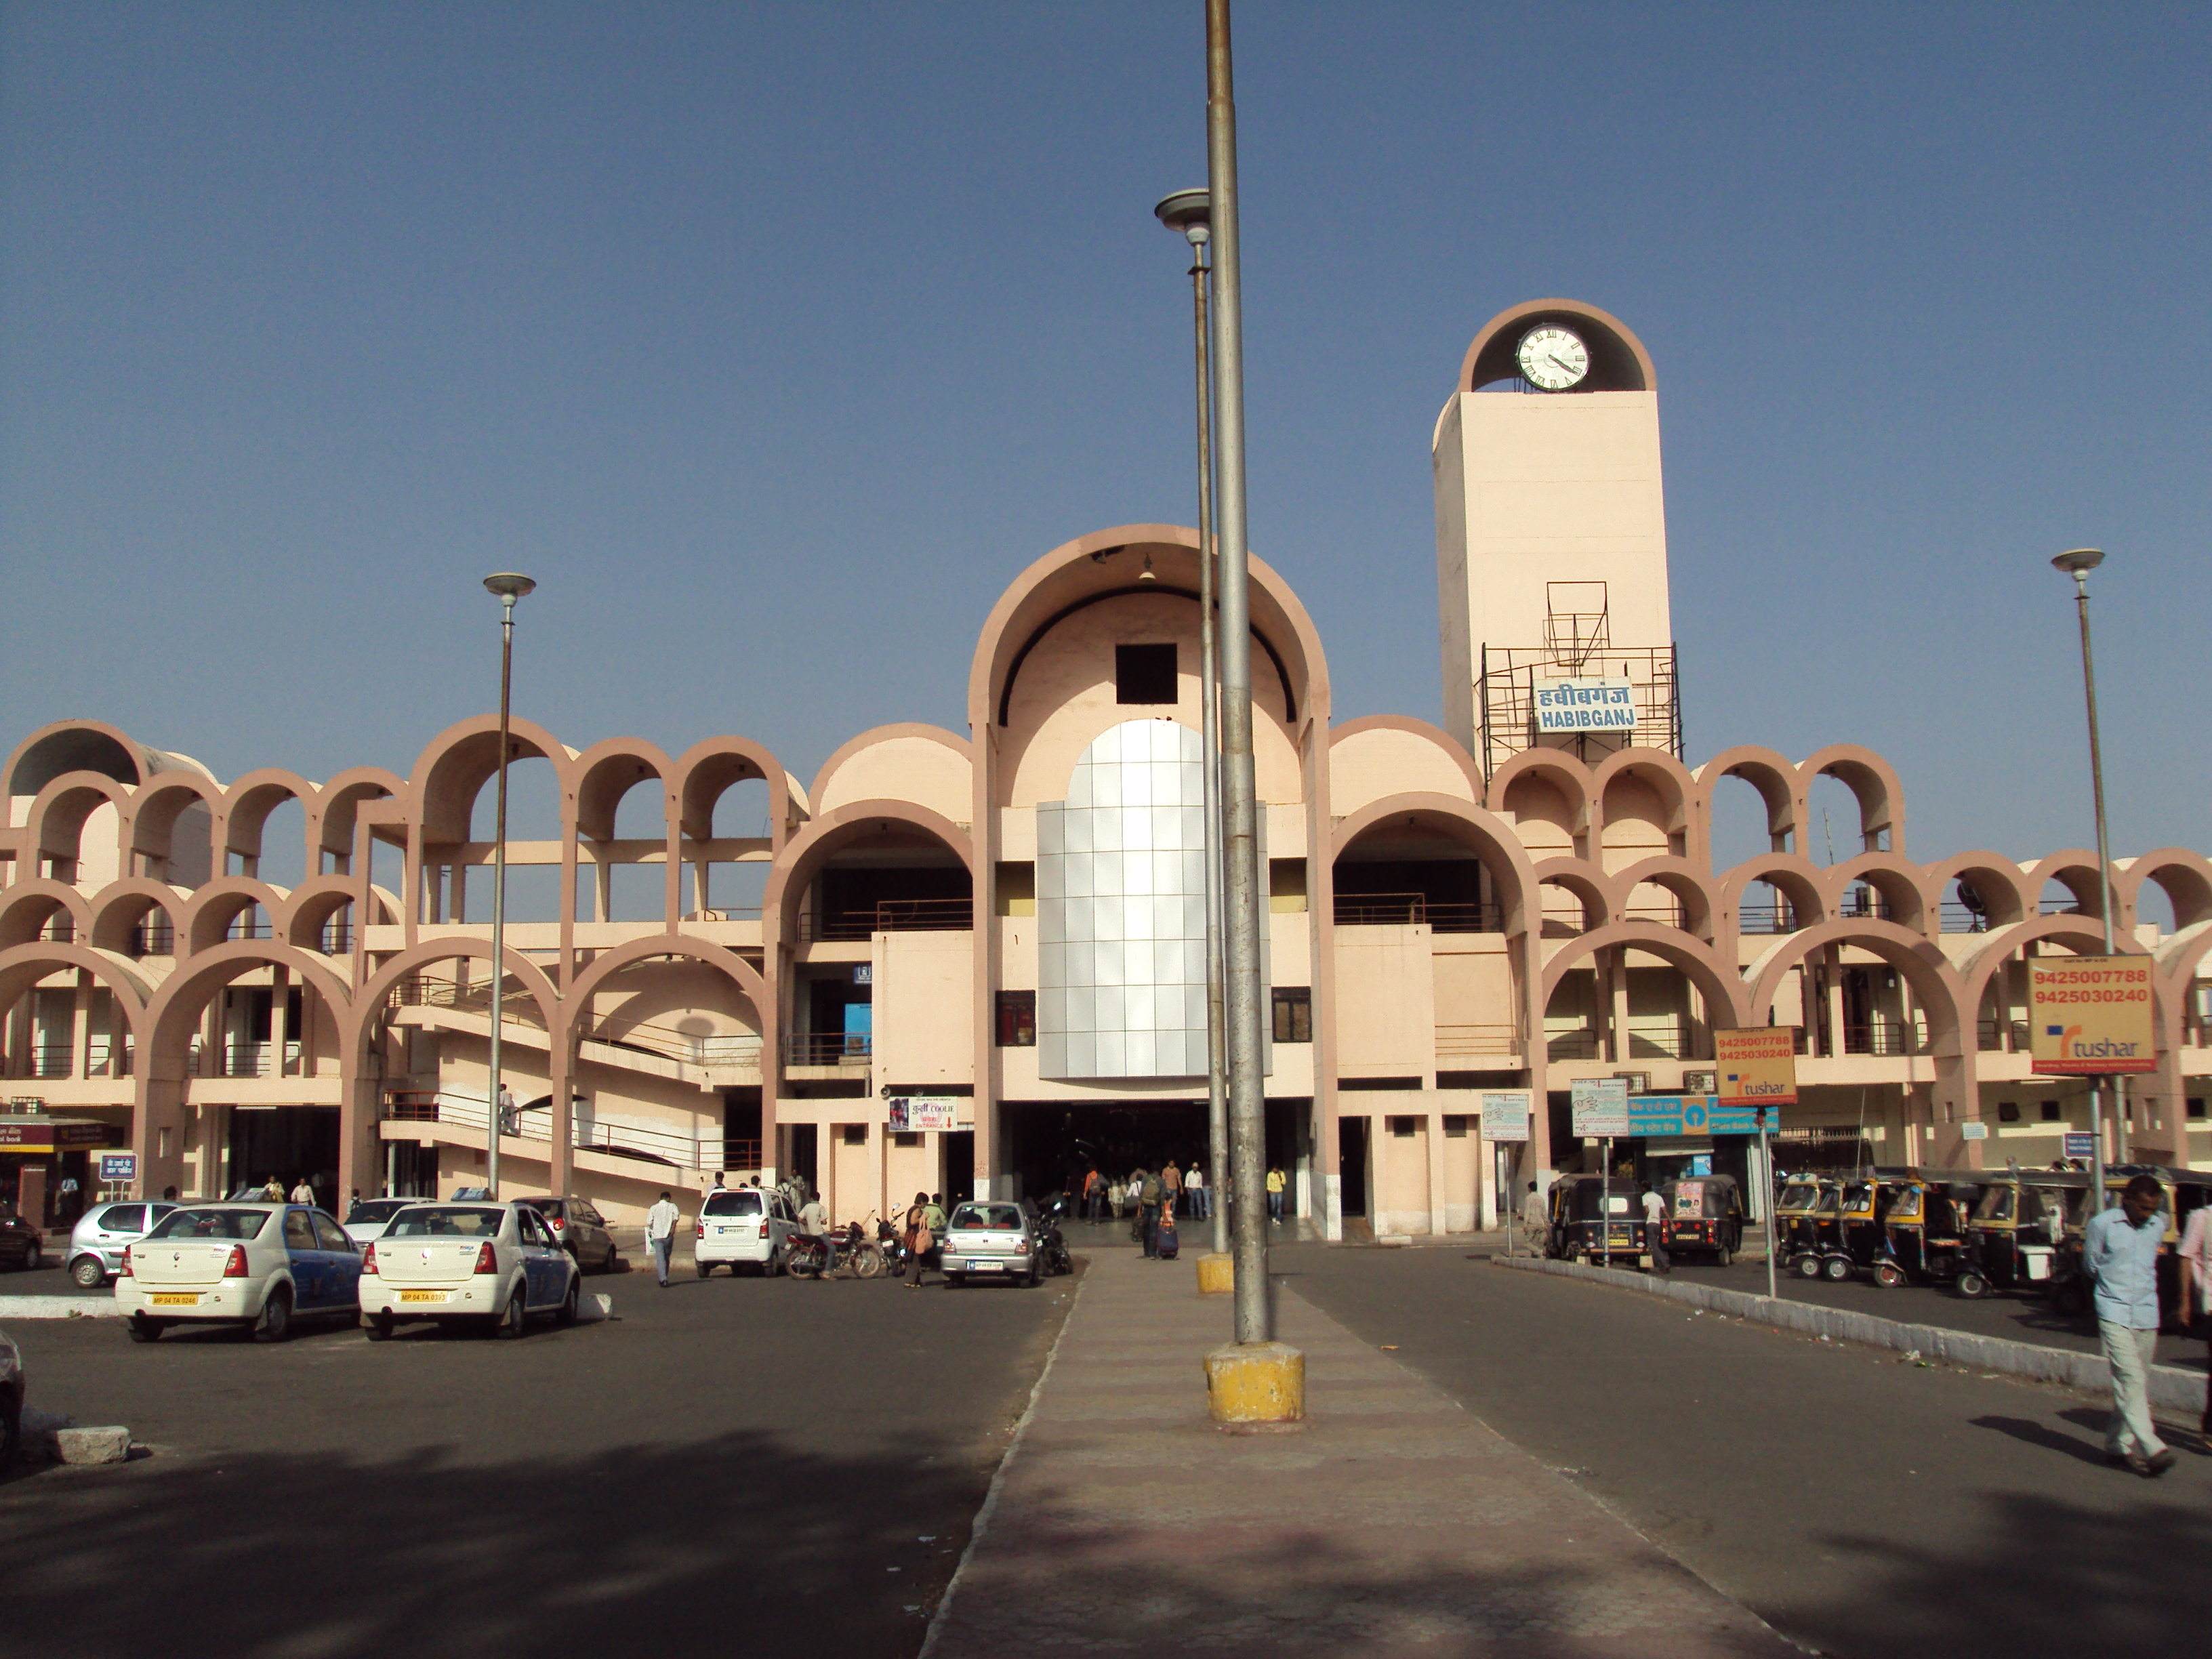 Habibganj railway station - Wikipedia